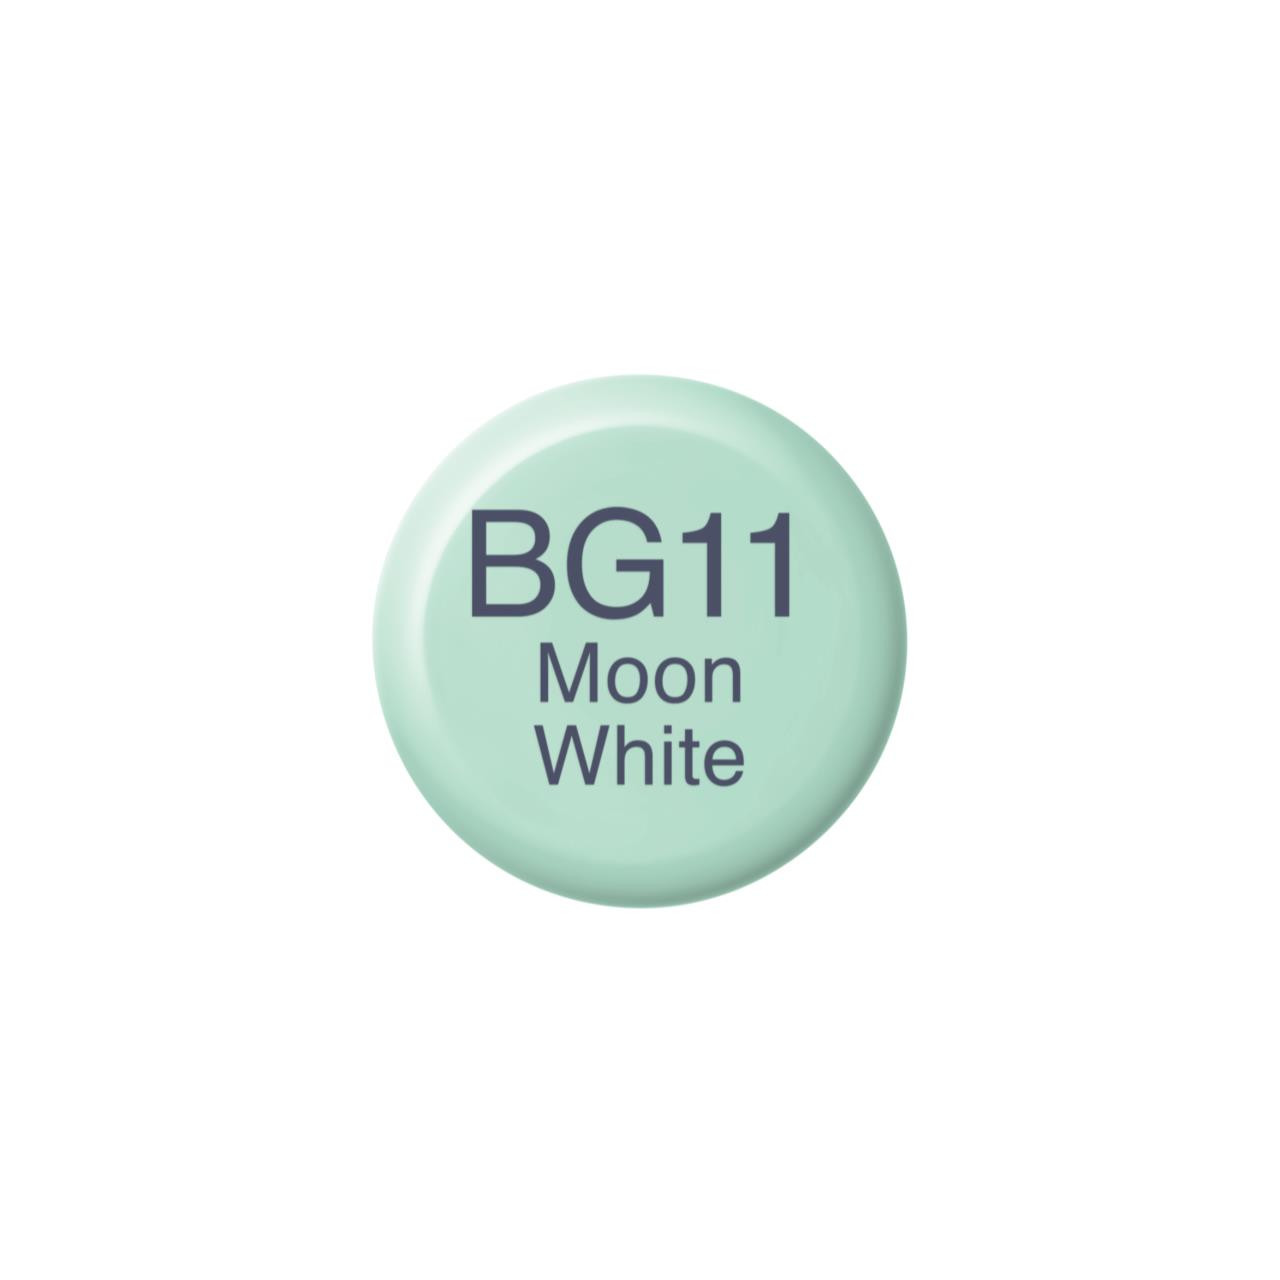 BG11 Moon White, Copic Ink - 4511338056233